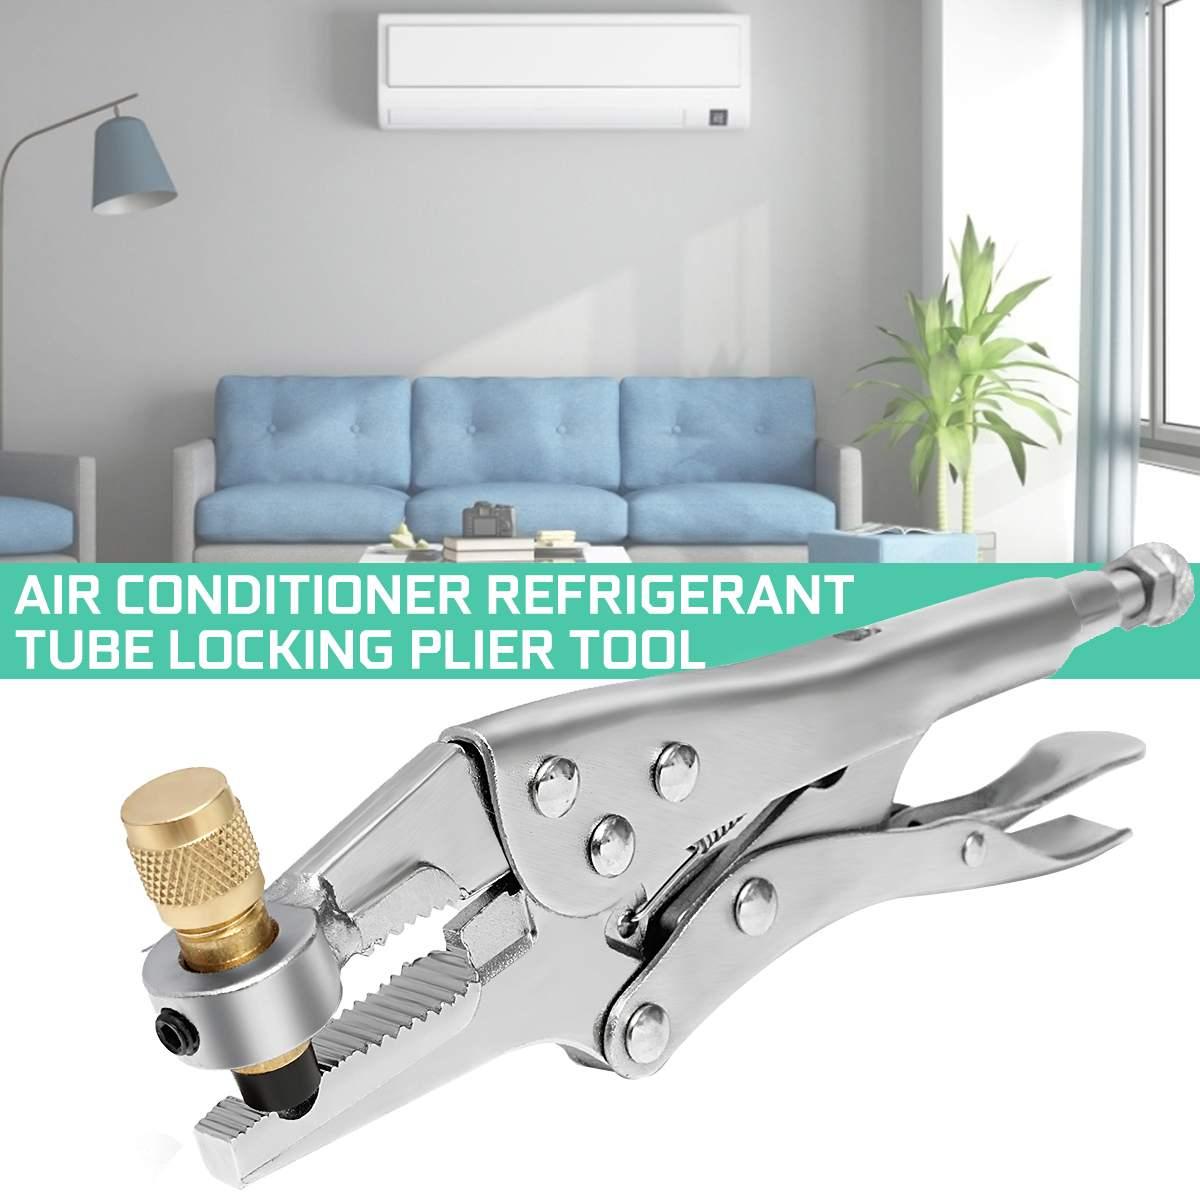 Air Conditioner Refrigerant Recovery Refrigeration Tube Locking Plier Tool